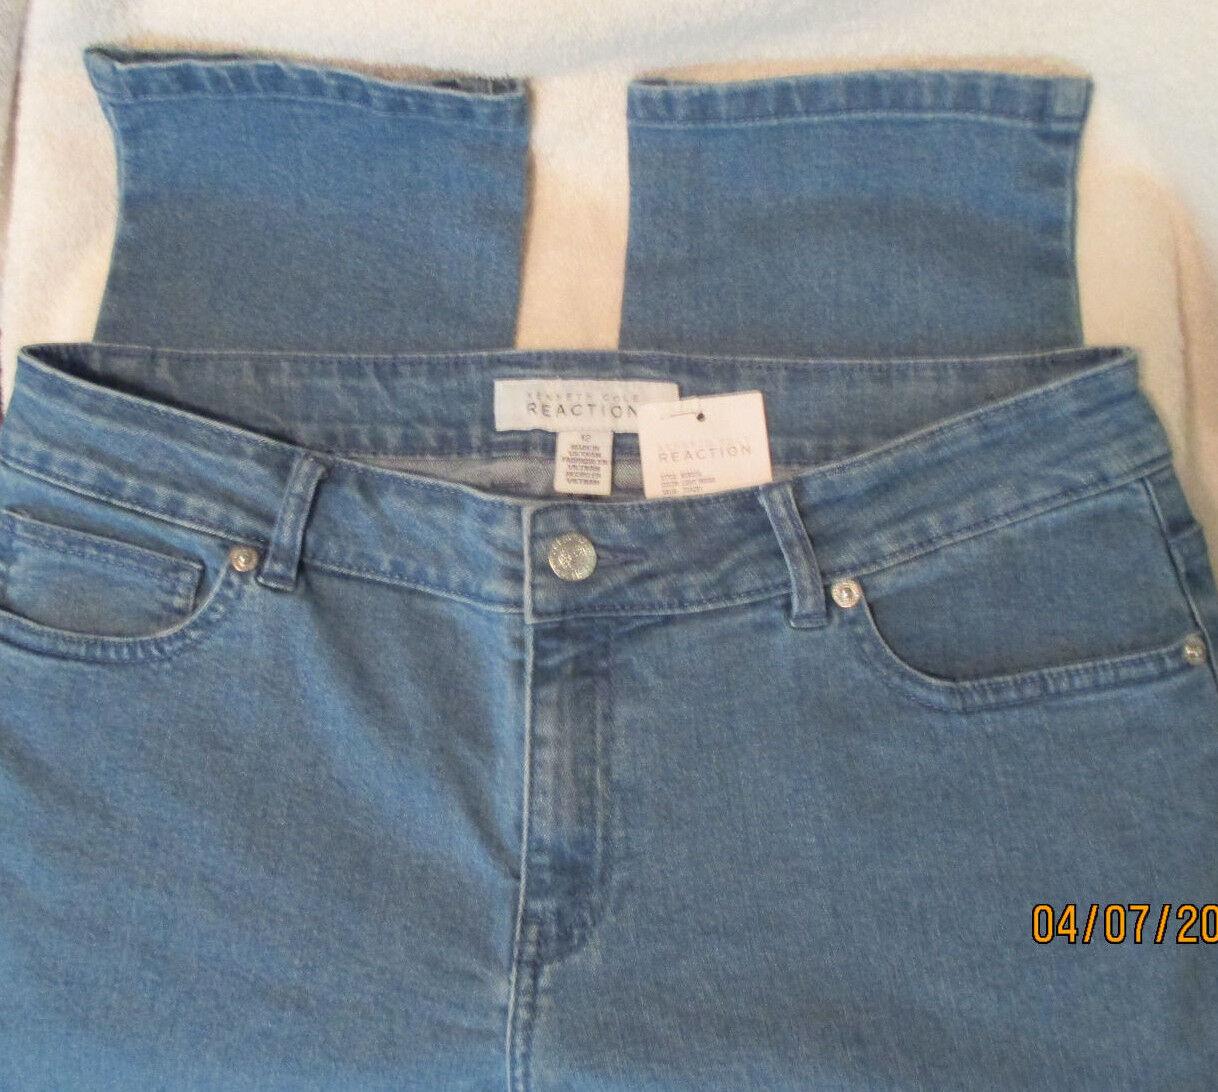 NWT  KENNETH COLE REACTION  Lt.Indigo, Cotton Blend, Skinny Crop,Jeans, 10R